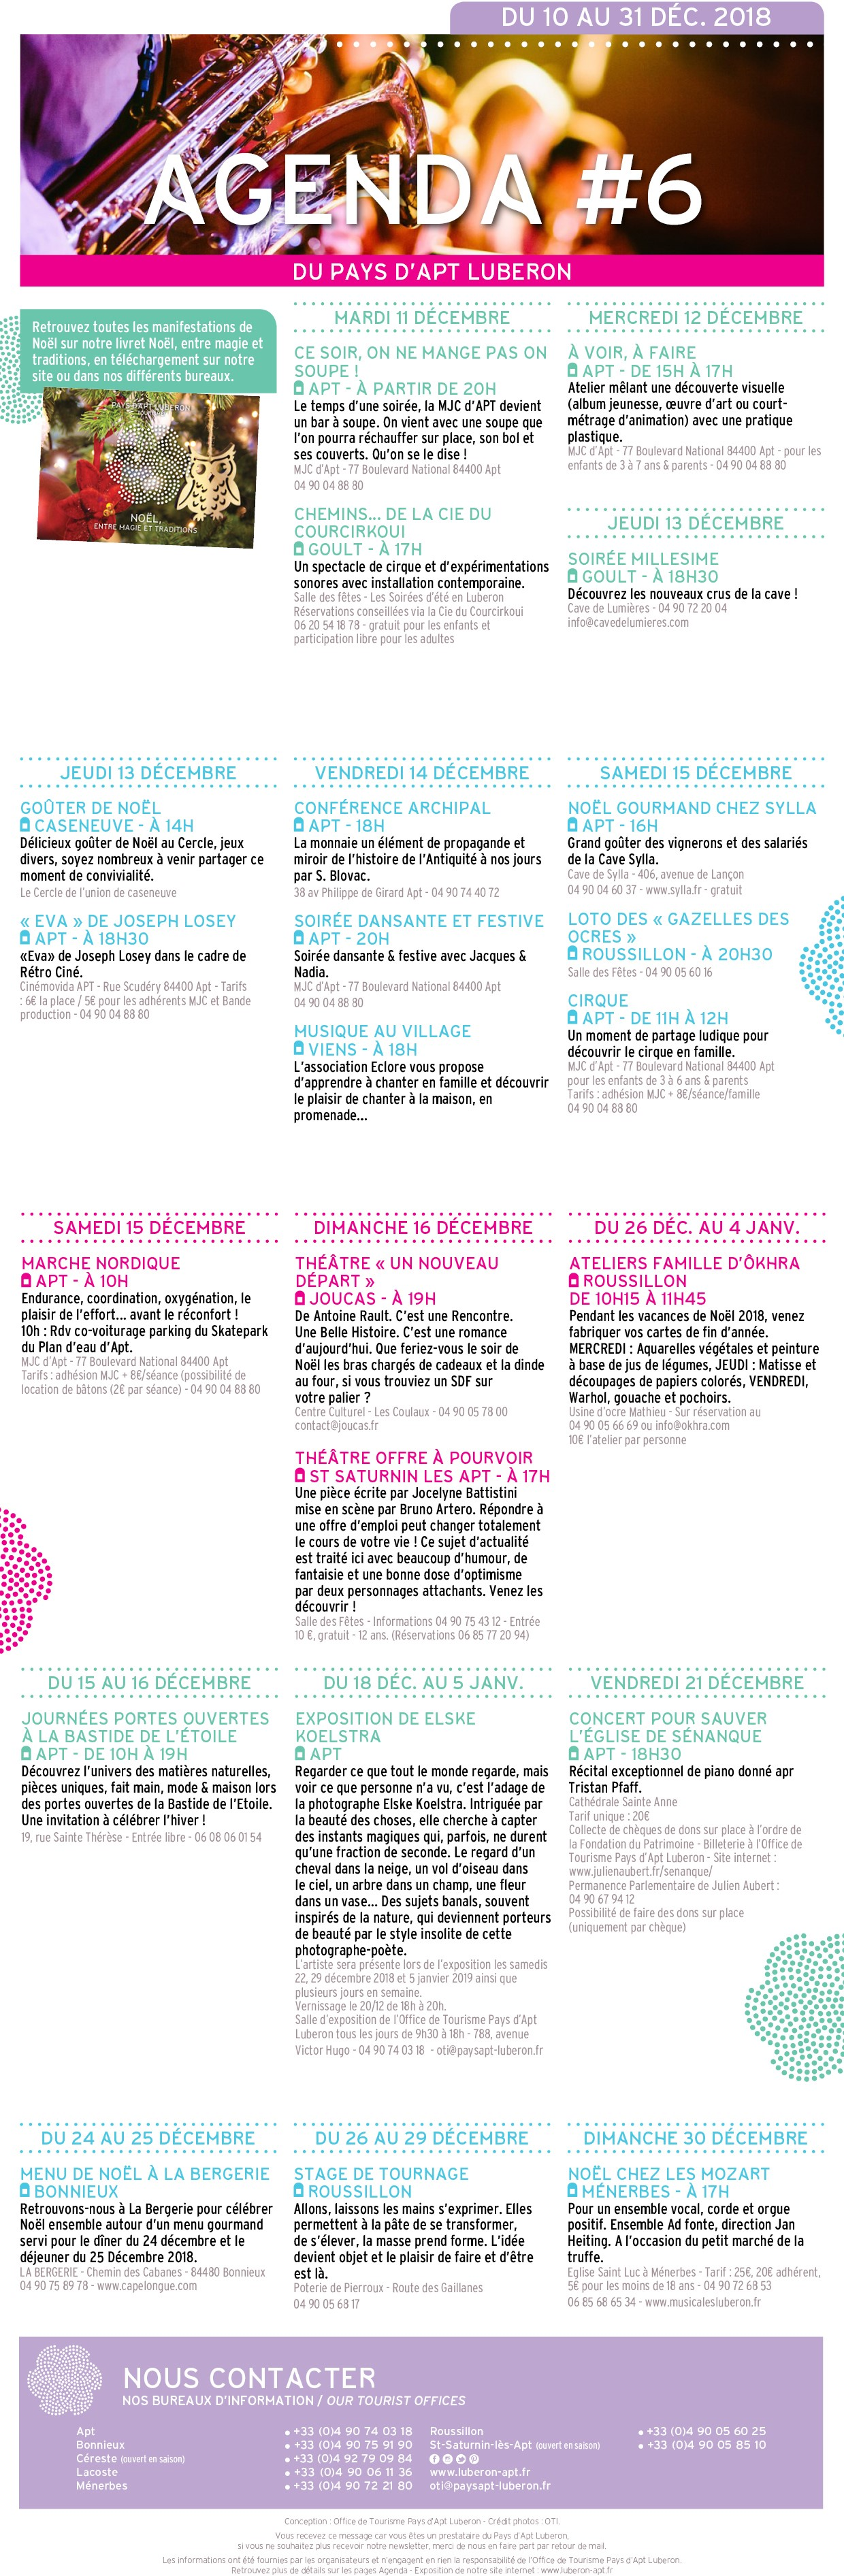 10 au 31 déc. 18 - agenda culturel - n°6